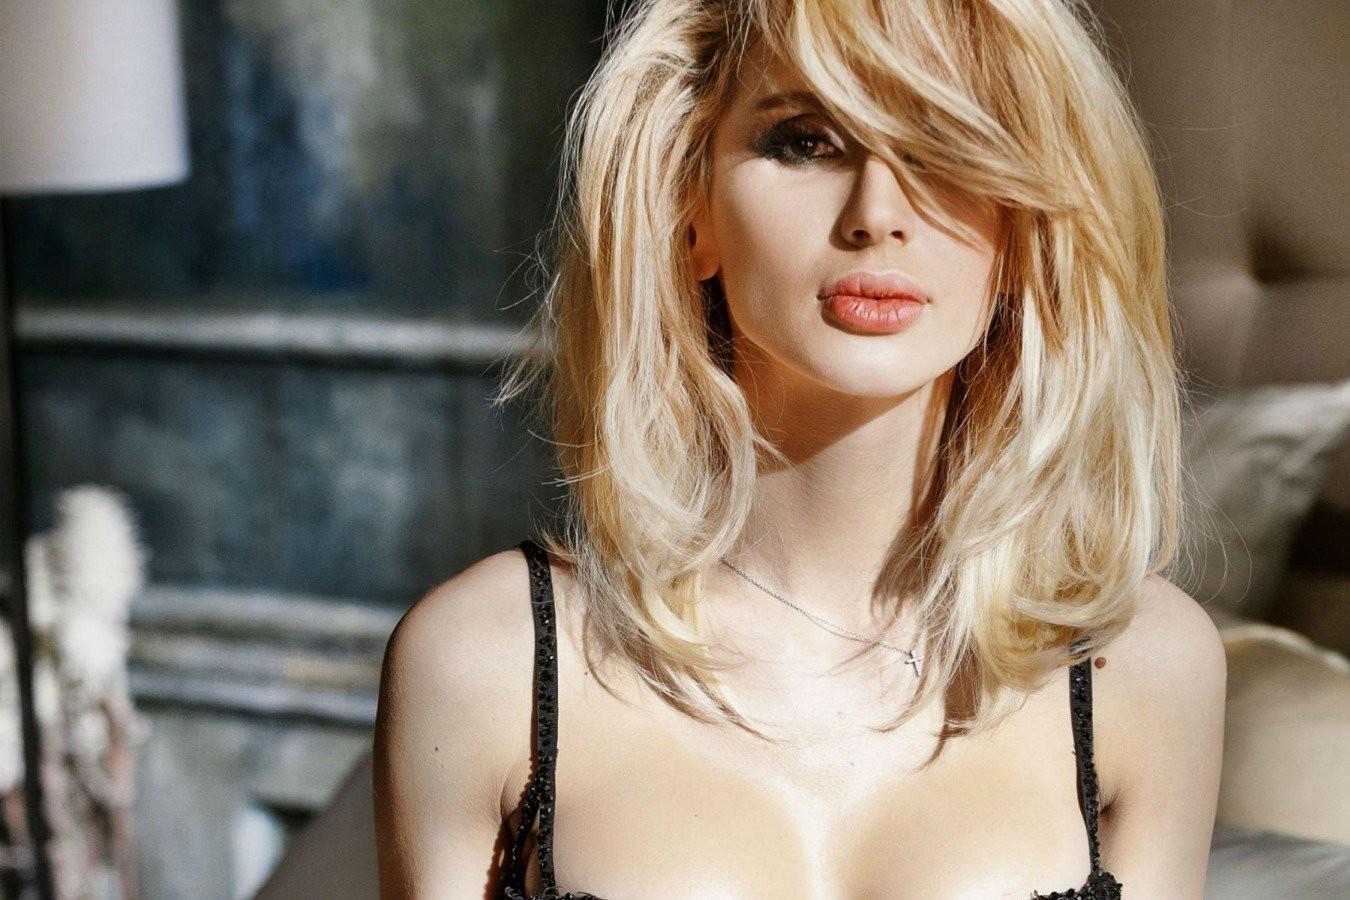 Светлана Лобода показала себя в ультракоротком сафари-жакете